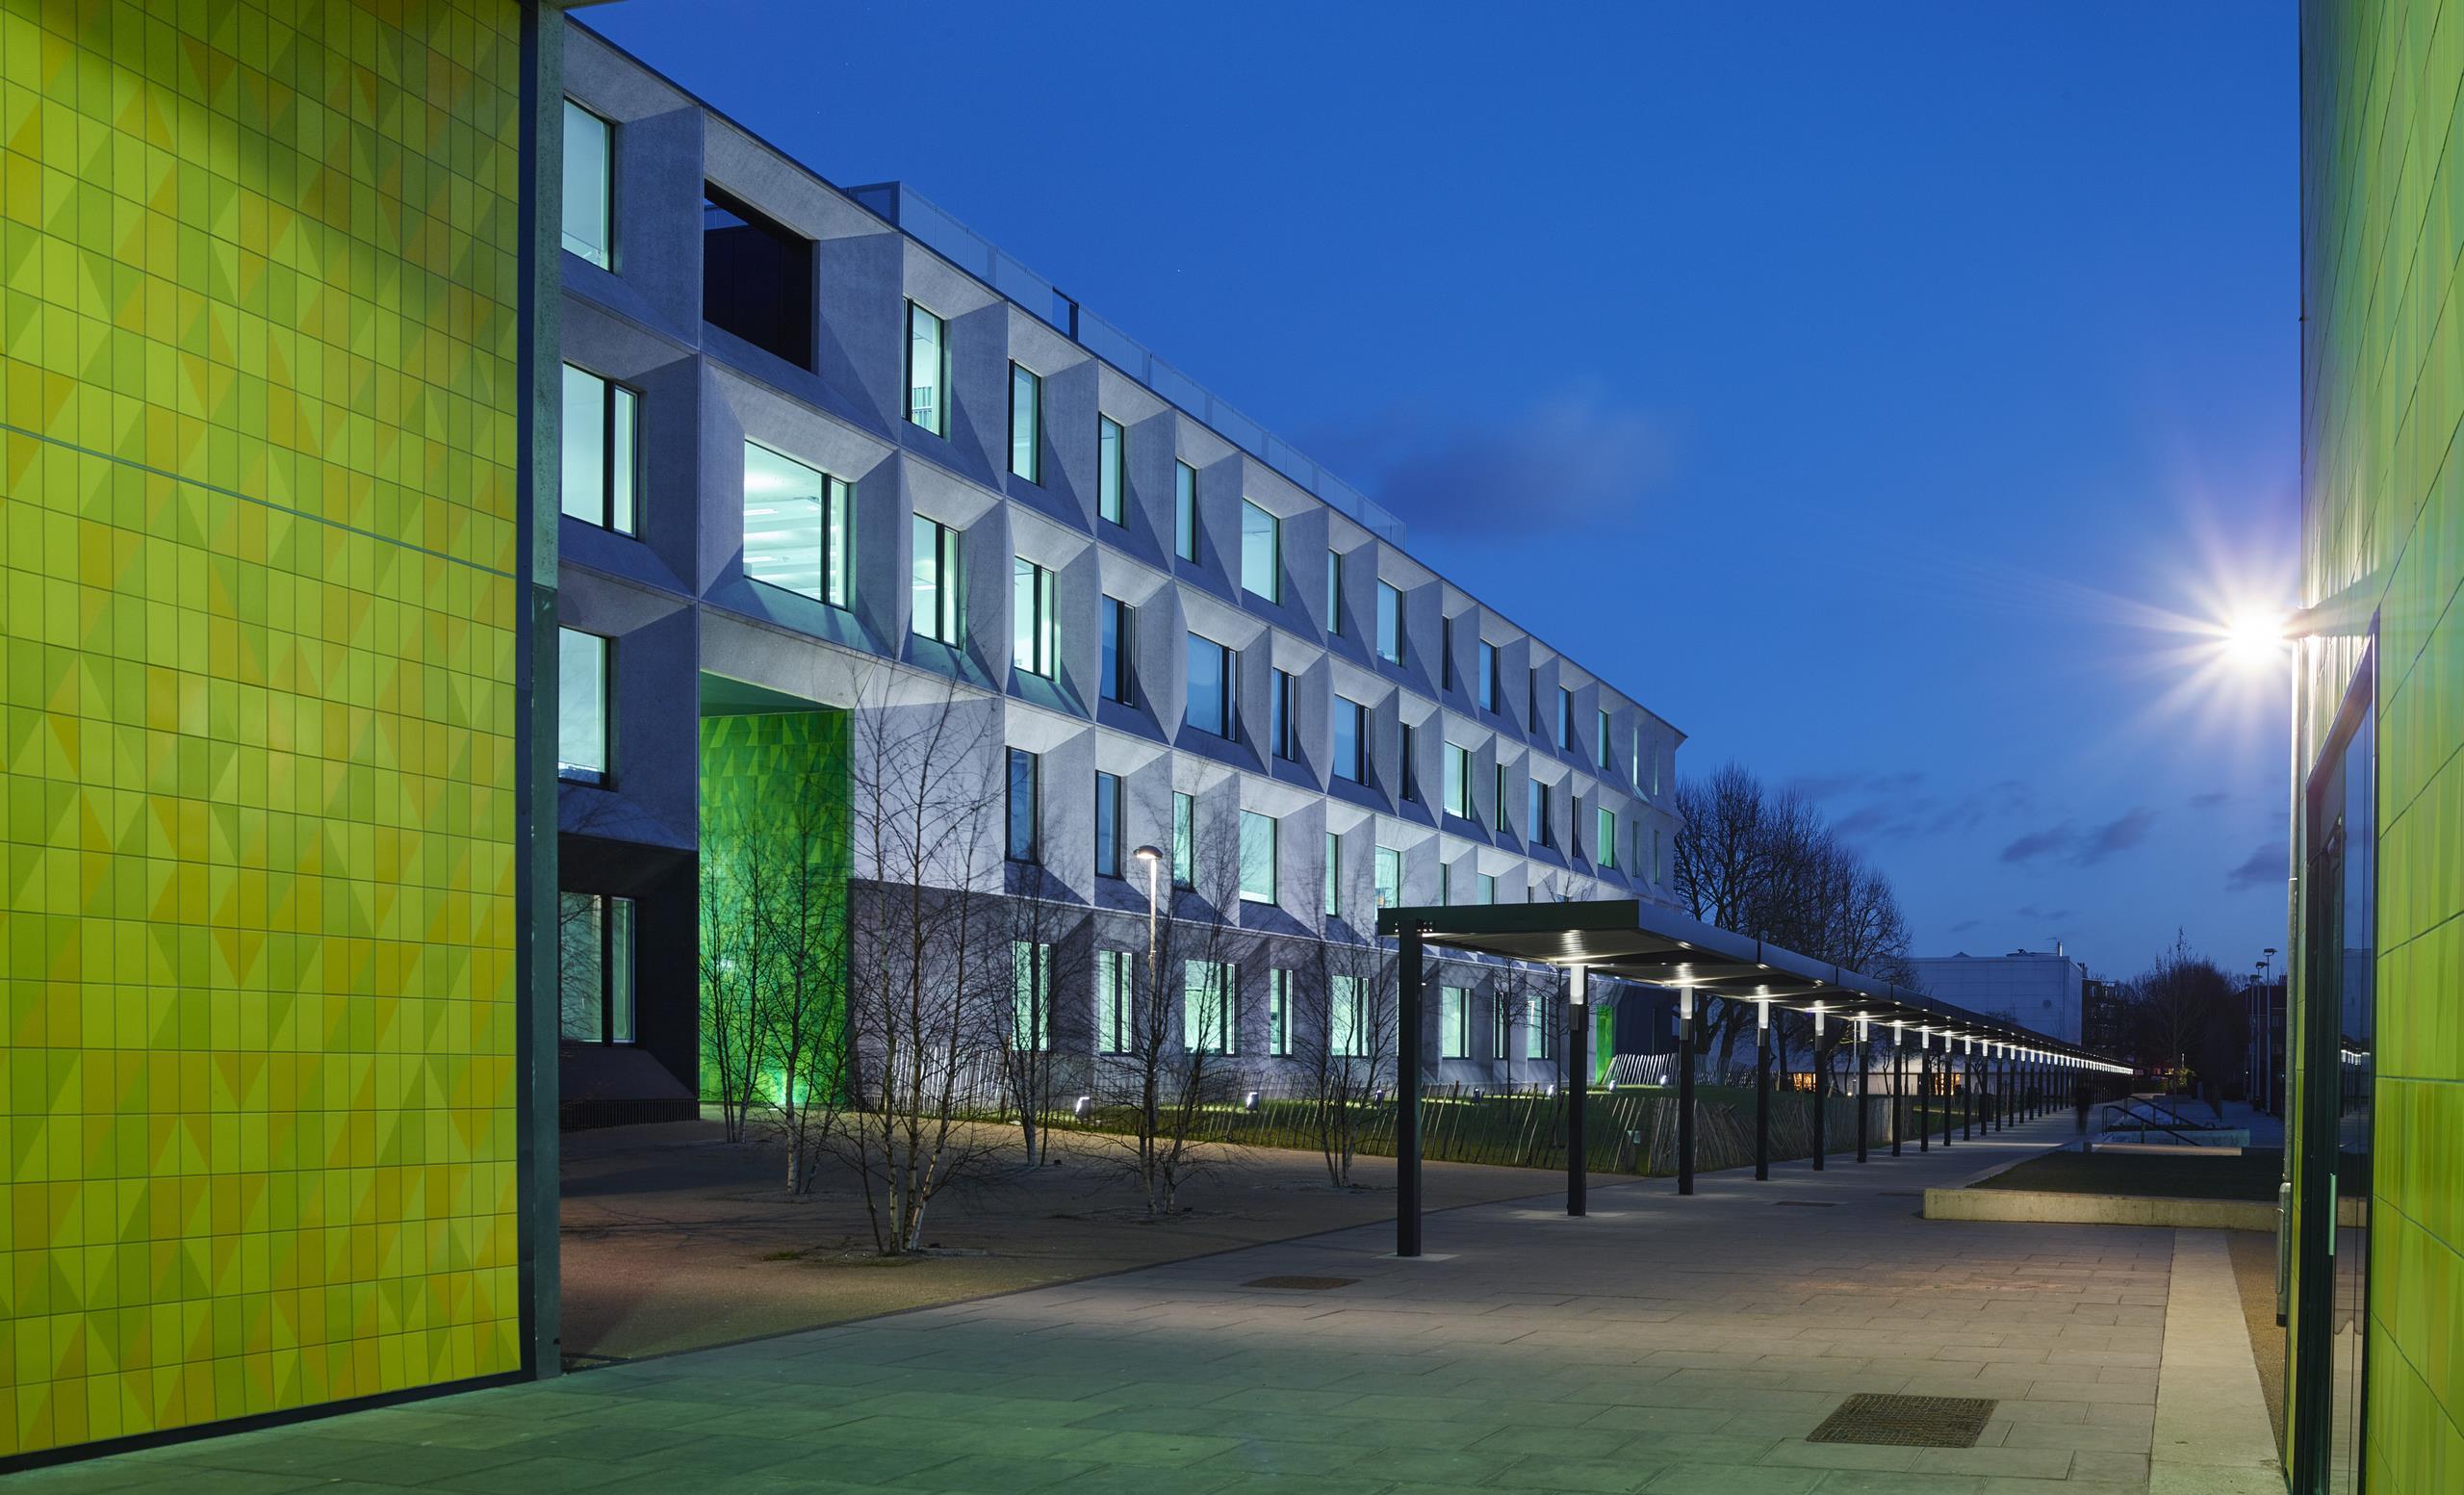 Burntwood School, London, Uk - Mott Macdonald-7572